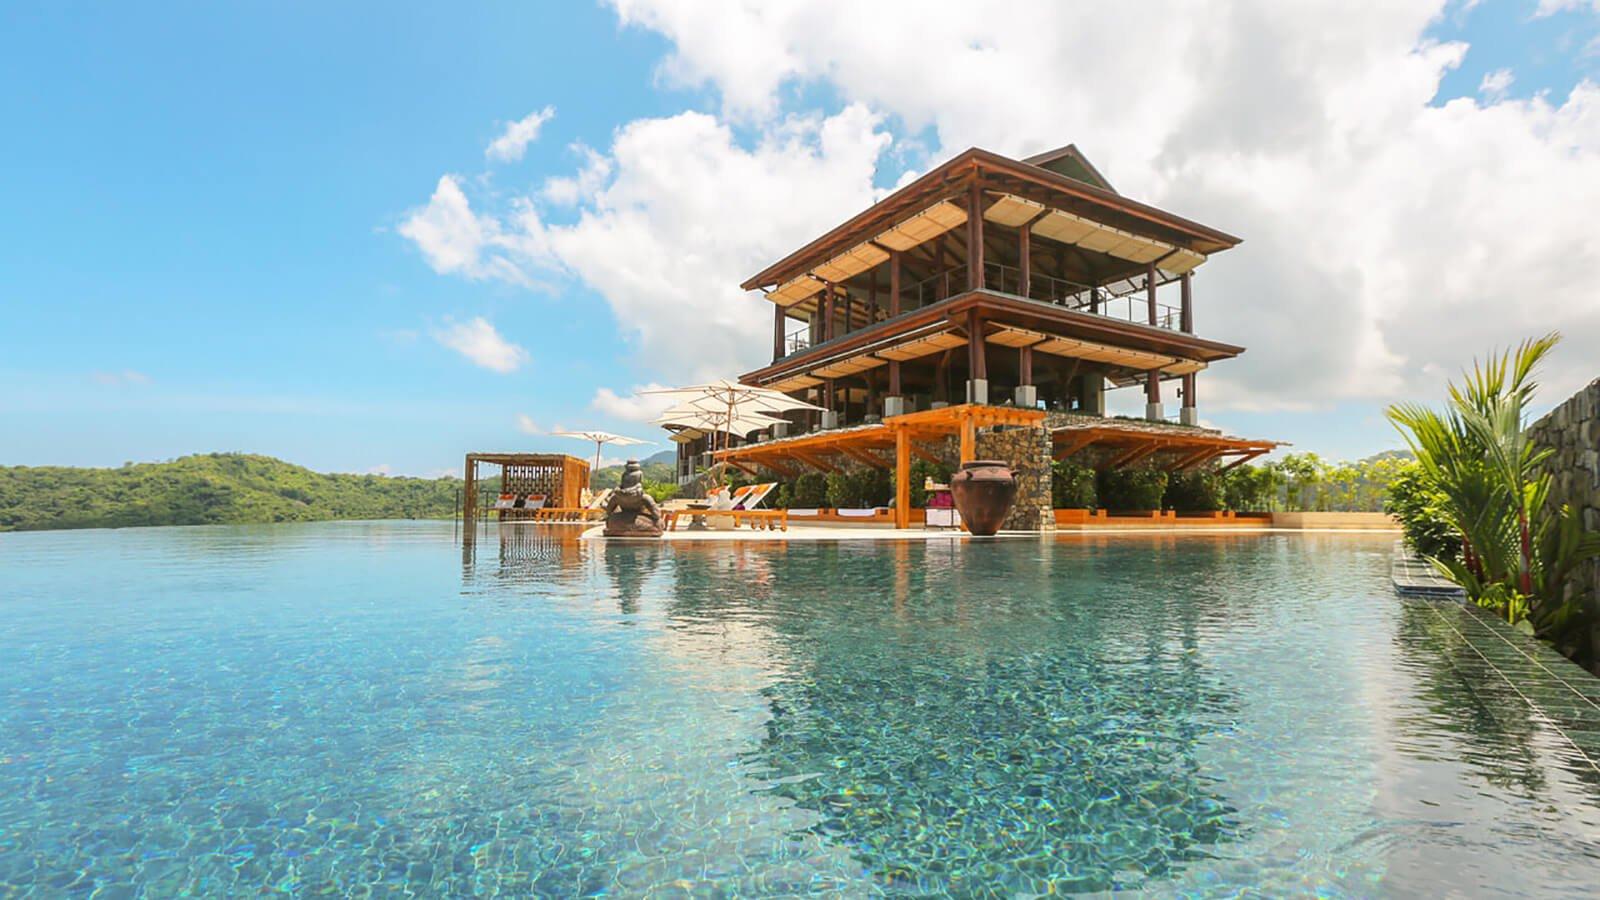 costa-rica-hotel-casa-chameleon-las-catalinas